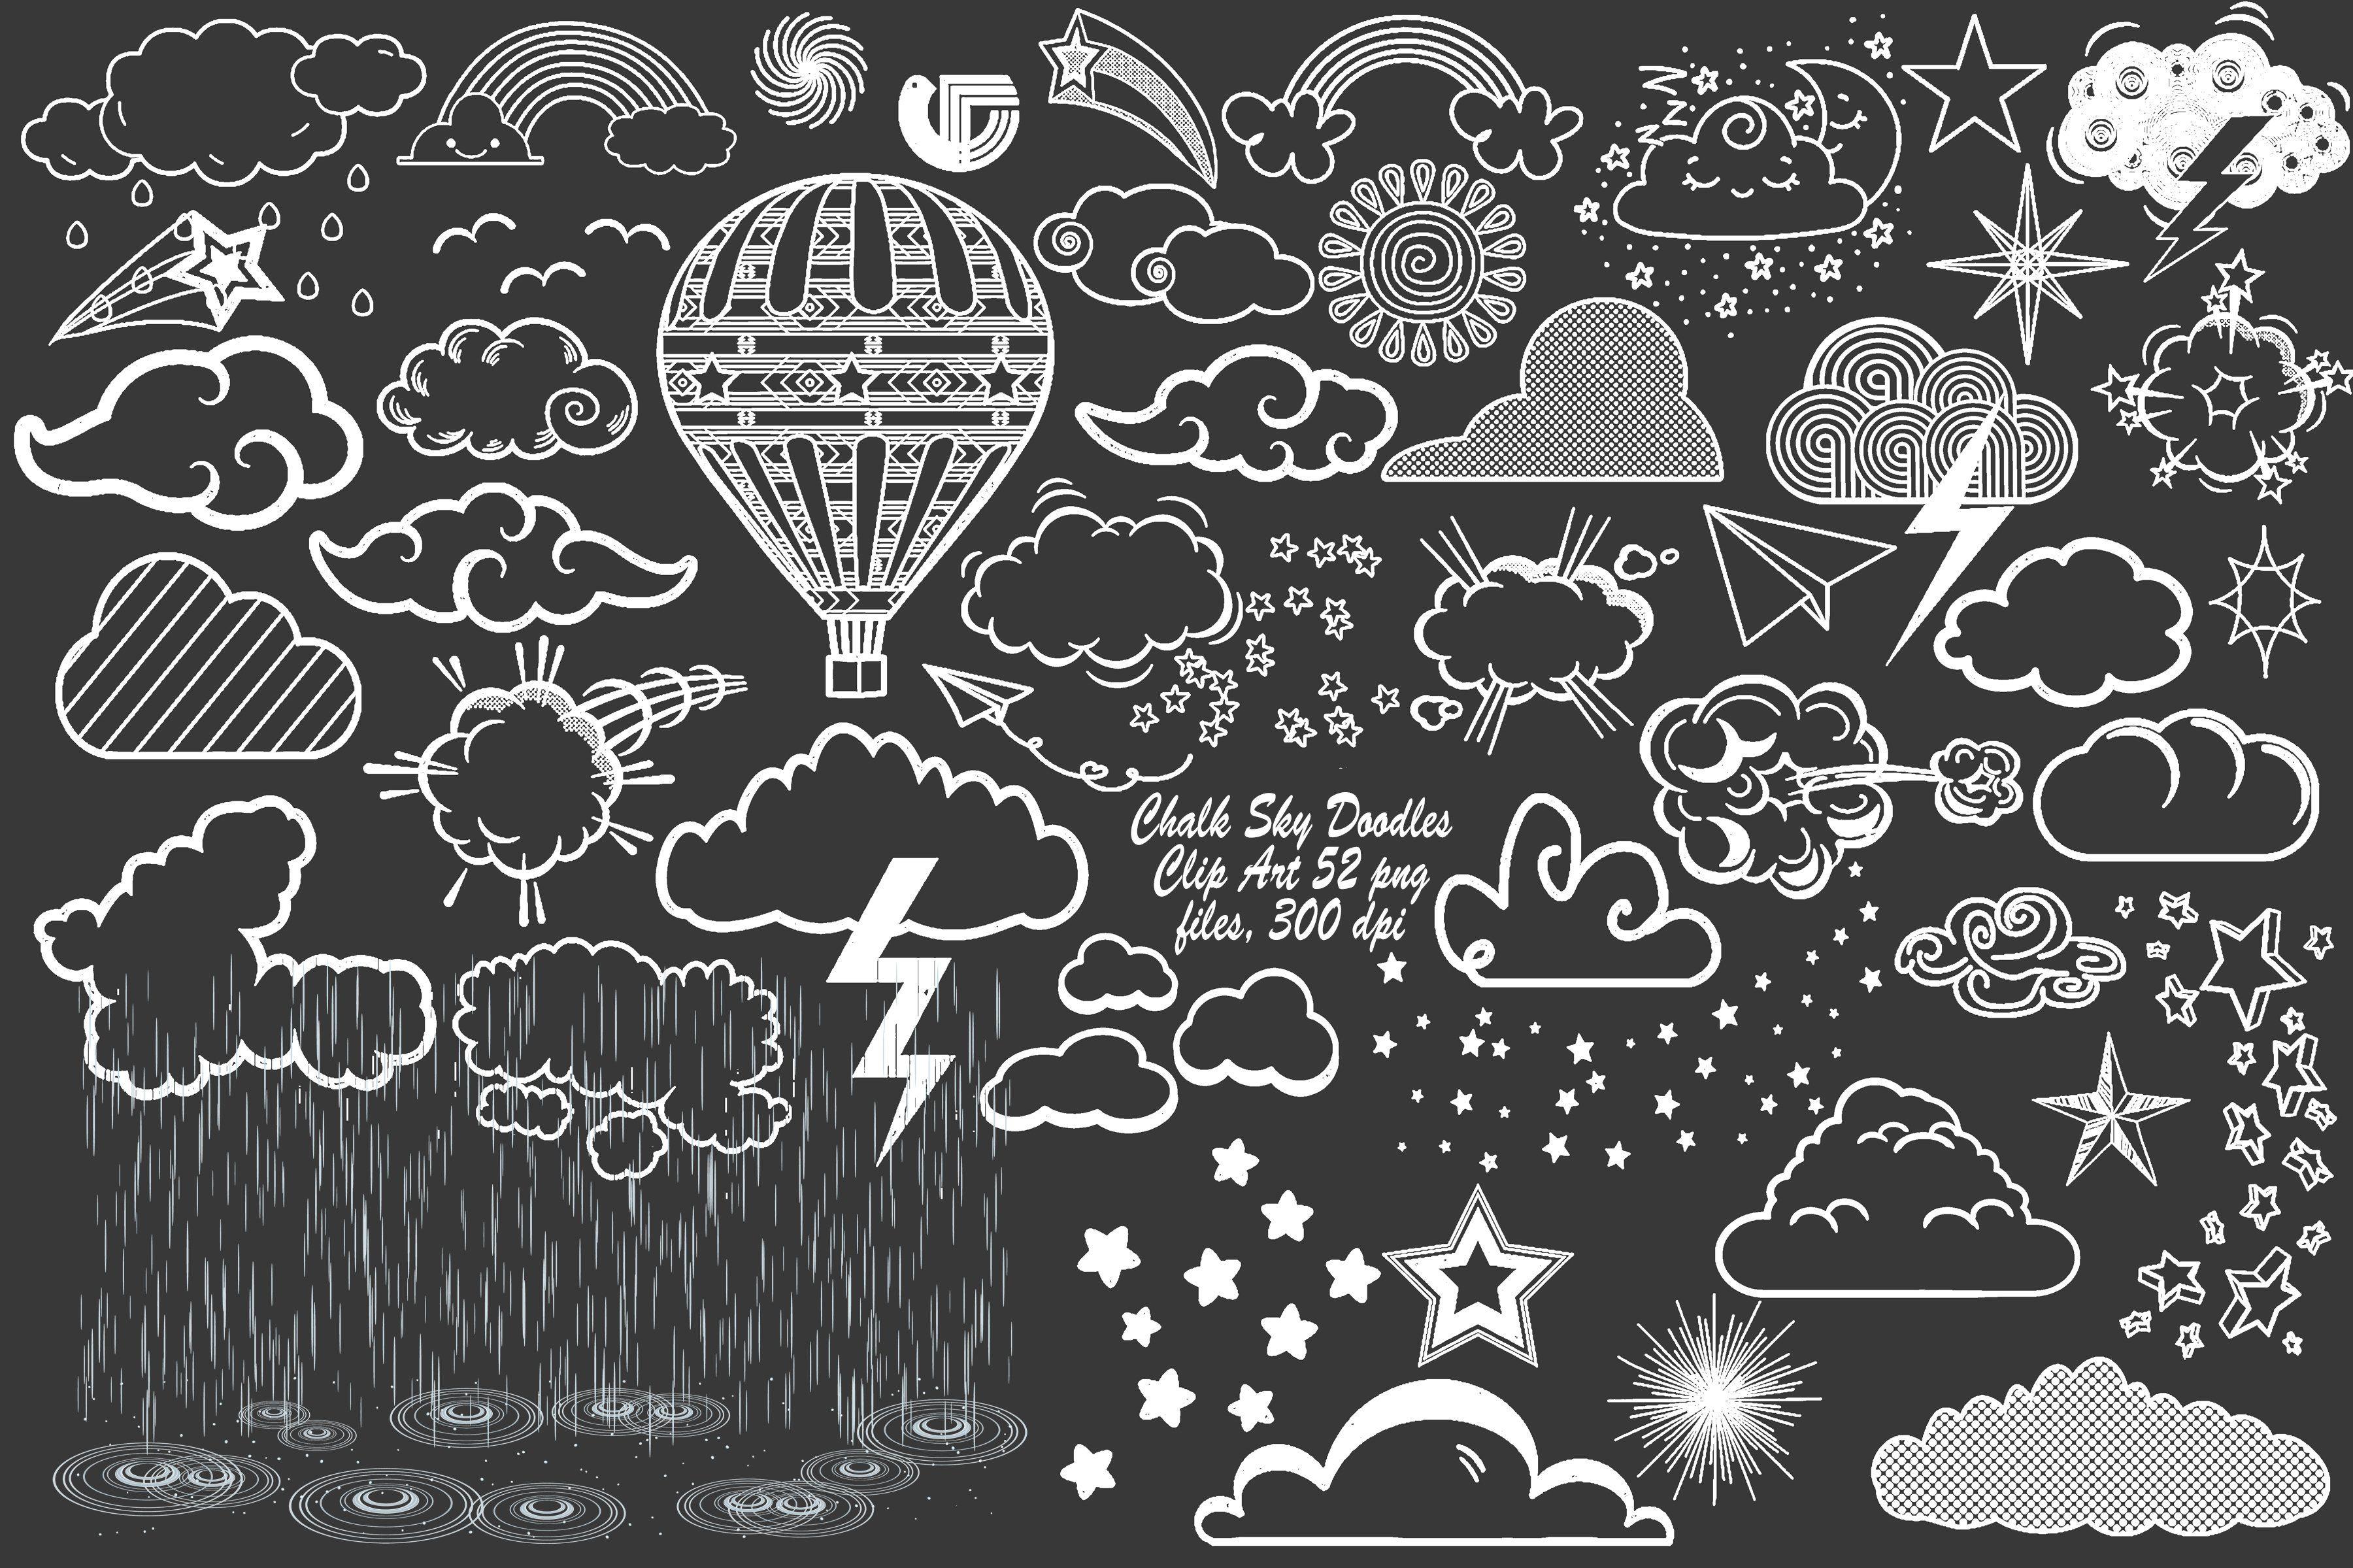 Chalk Sky Doodles W Rain Overlay Doodles Clip Art Graphic Design Background Templates